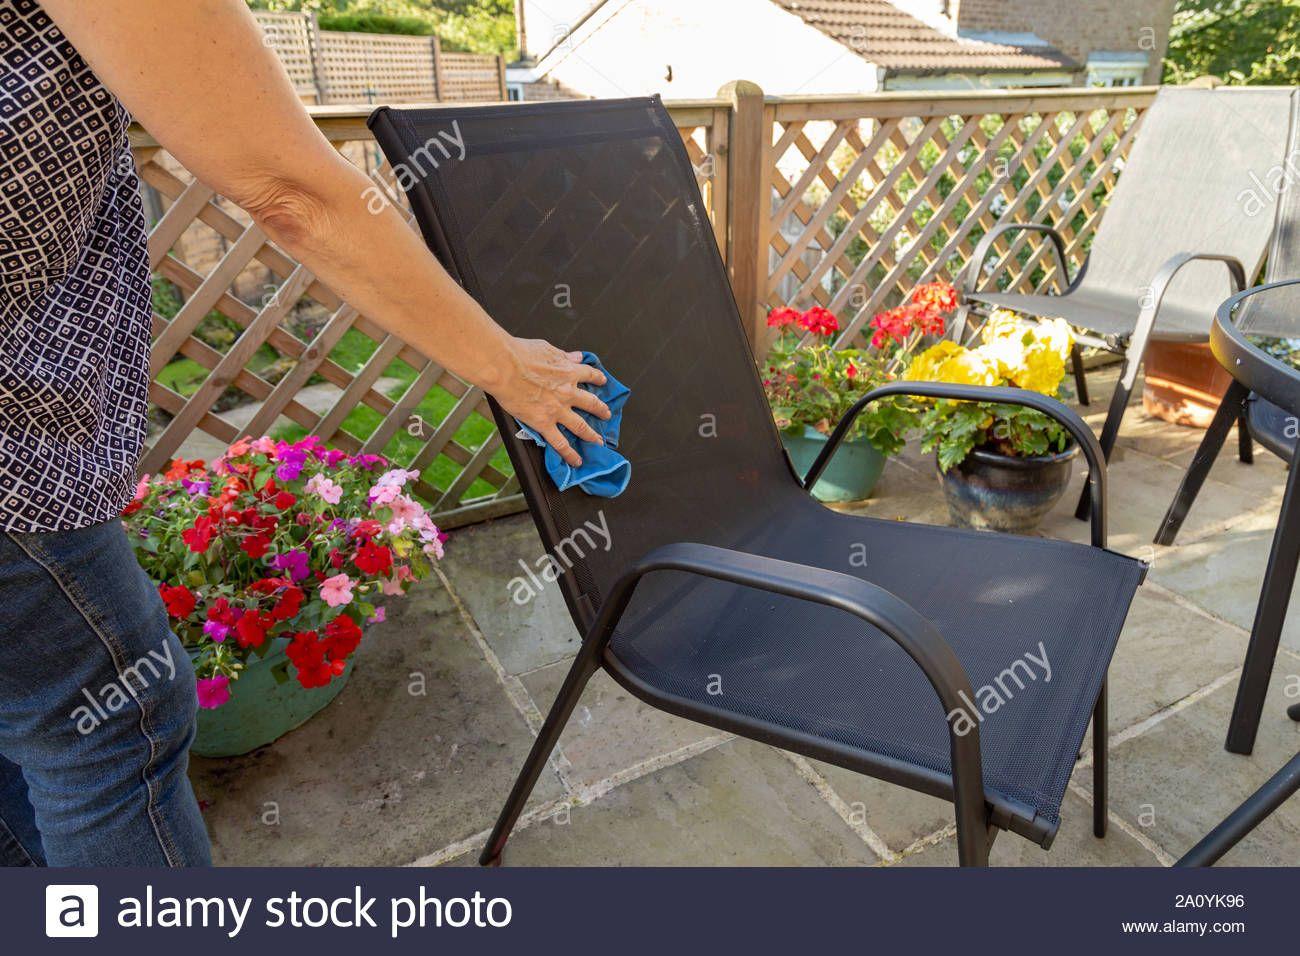 limpieza-de-muebles - limpieza de muebles de jardin 2a0yk96